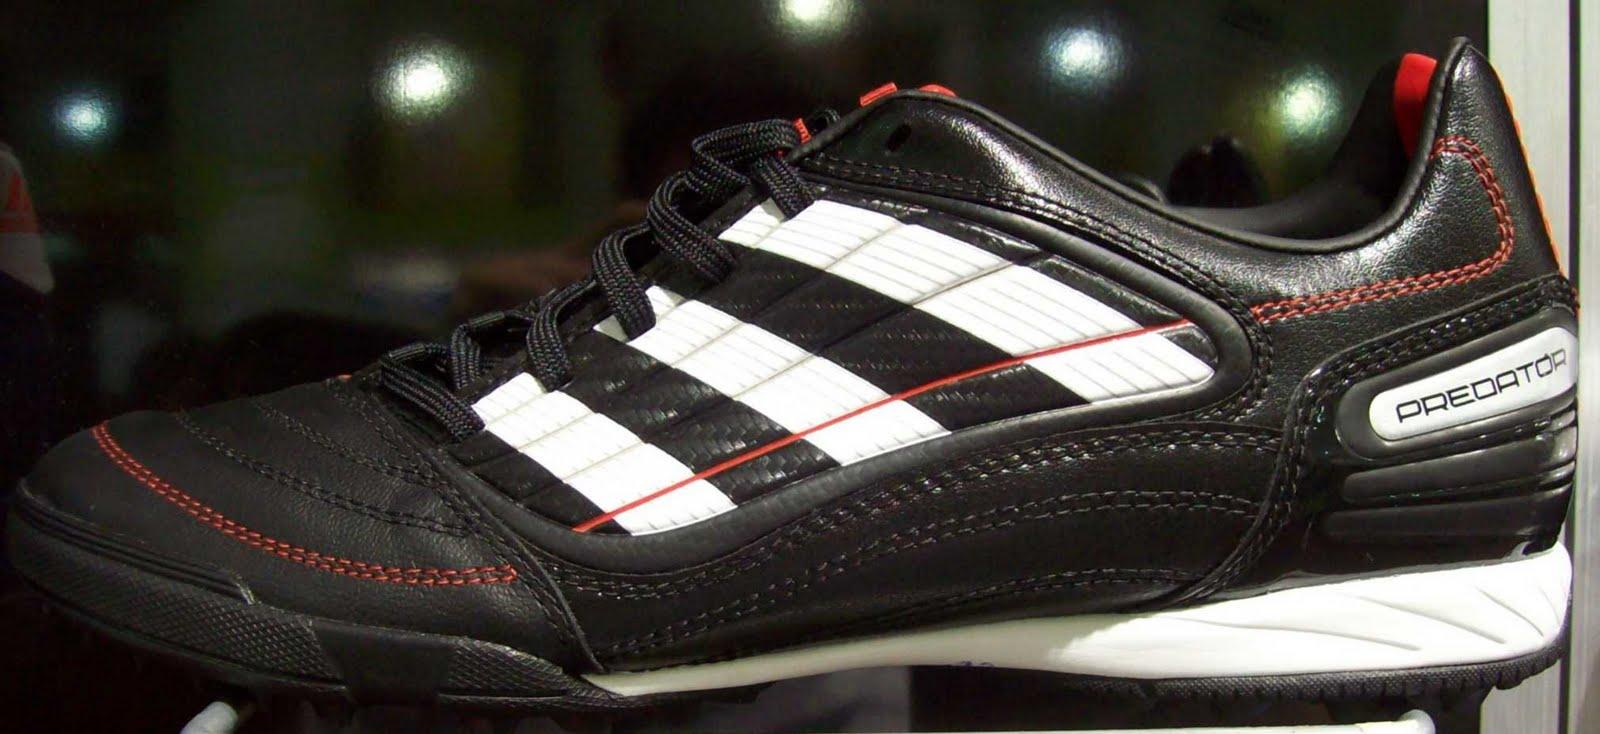 952d9af6a3a9 ... reduced botines adidas predator 2010 colores varios 264 43f53 98bb4